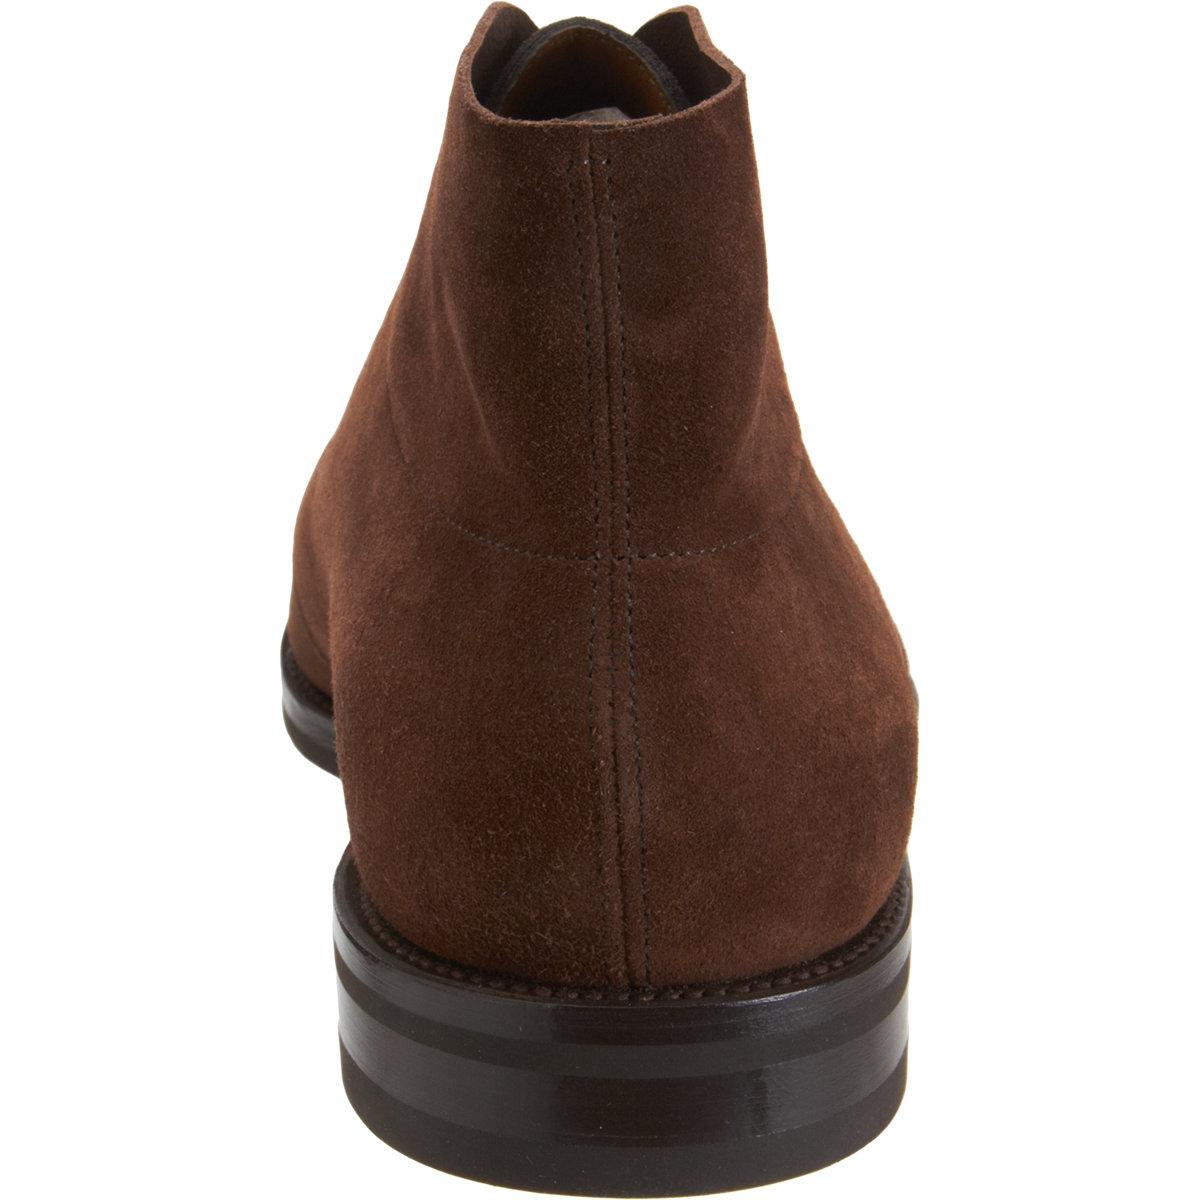 John Lobb Romsey Ii Chukka Boots In Brown For Men Dk